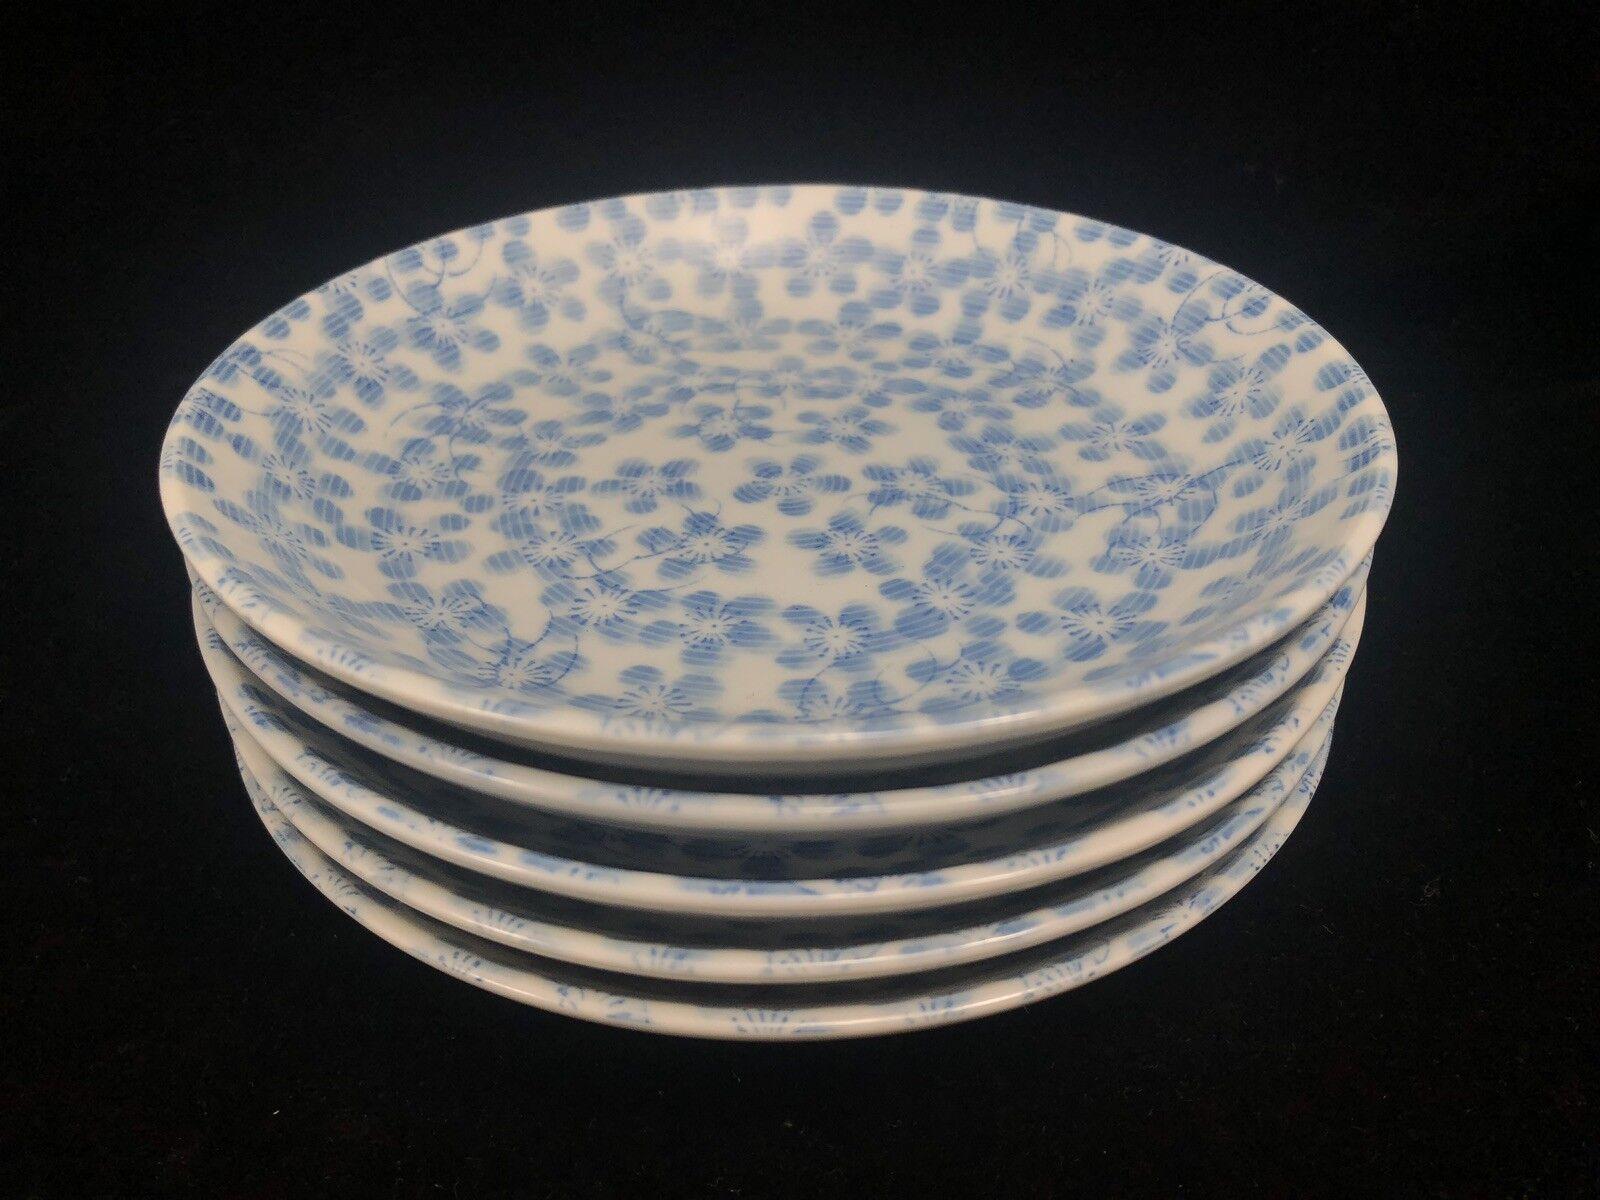 CHERRY PLUM BLOSSOM 6.5  Bread PLATES 5pc Vintage Japanese bluee Floral Porcelain